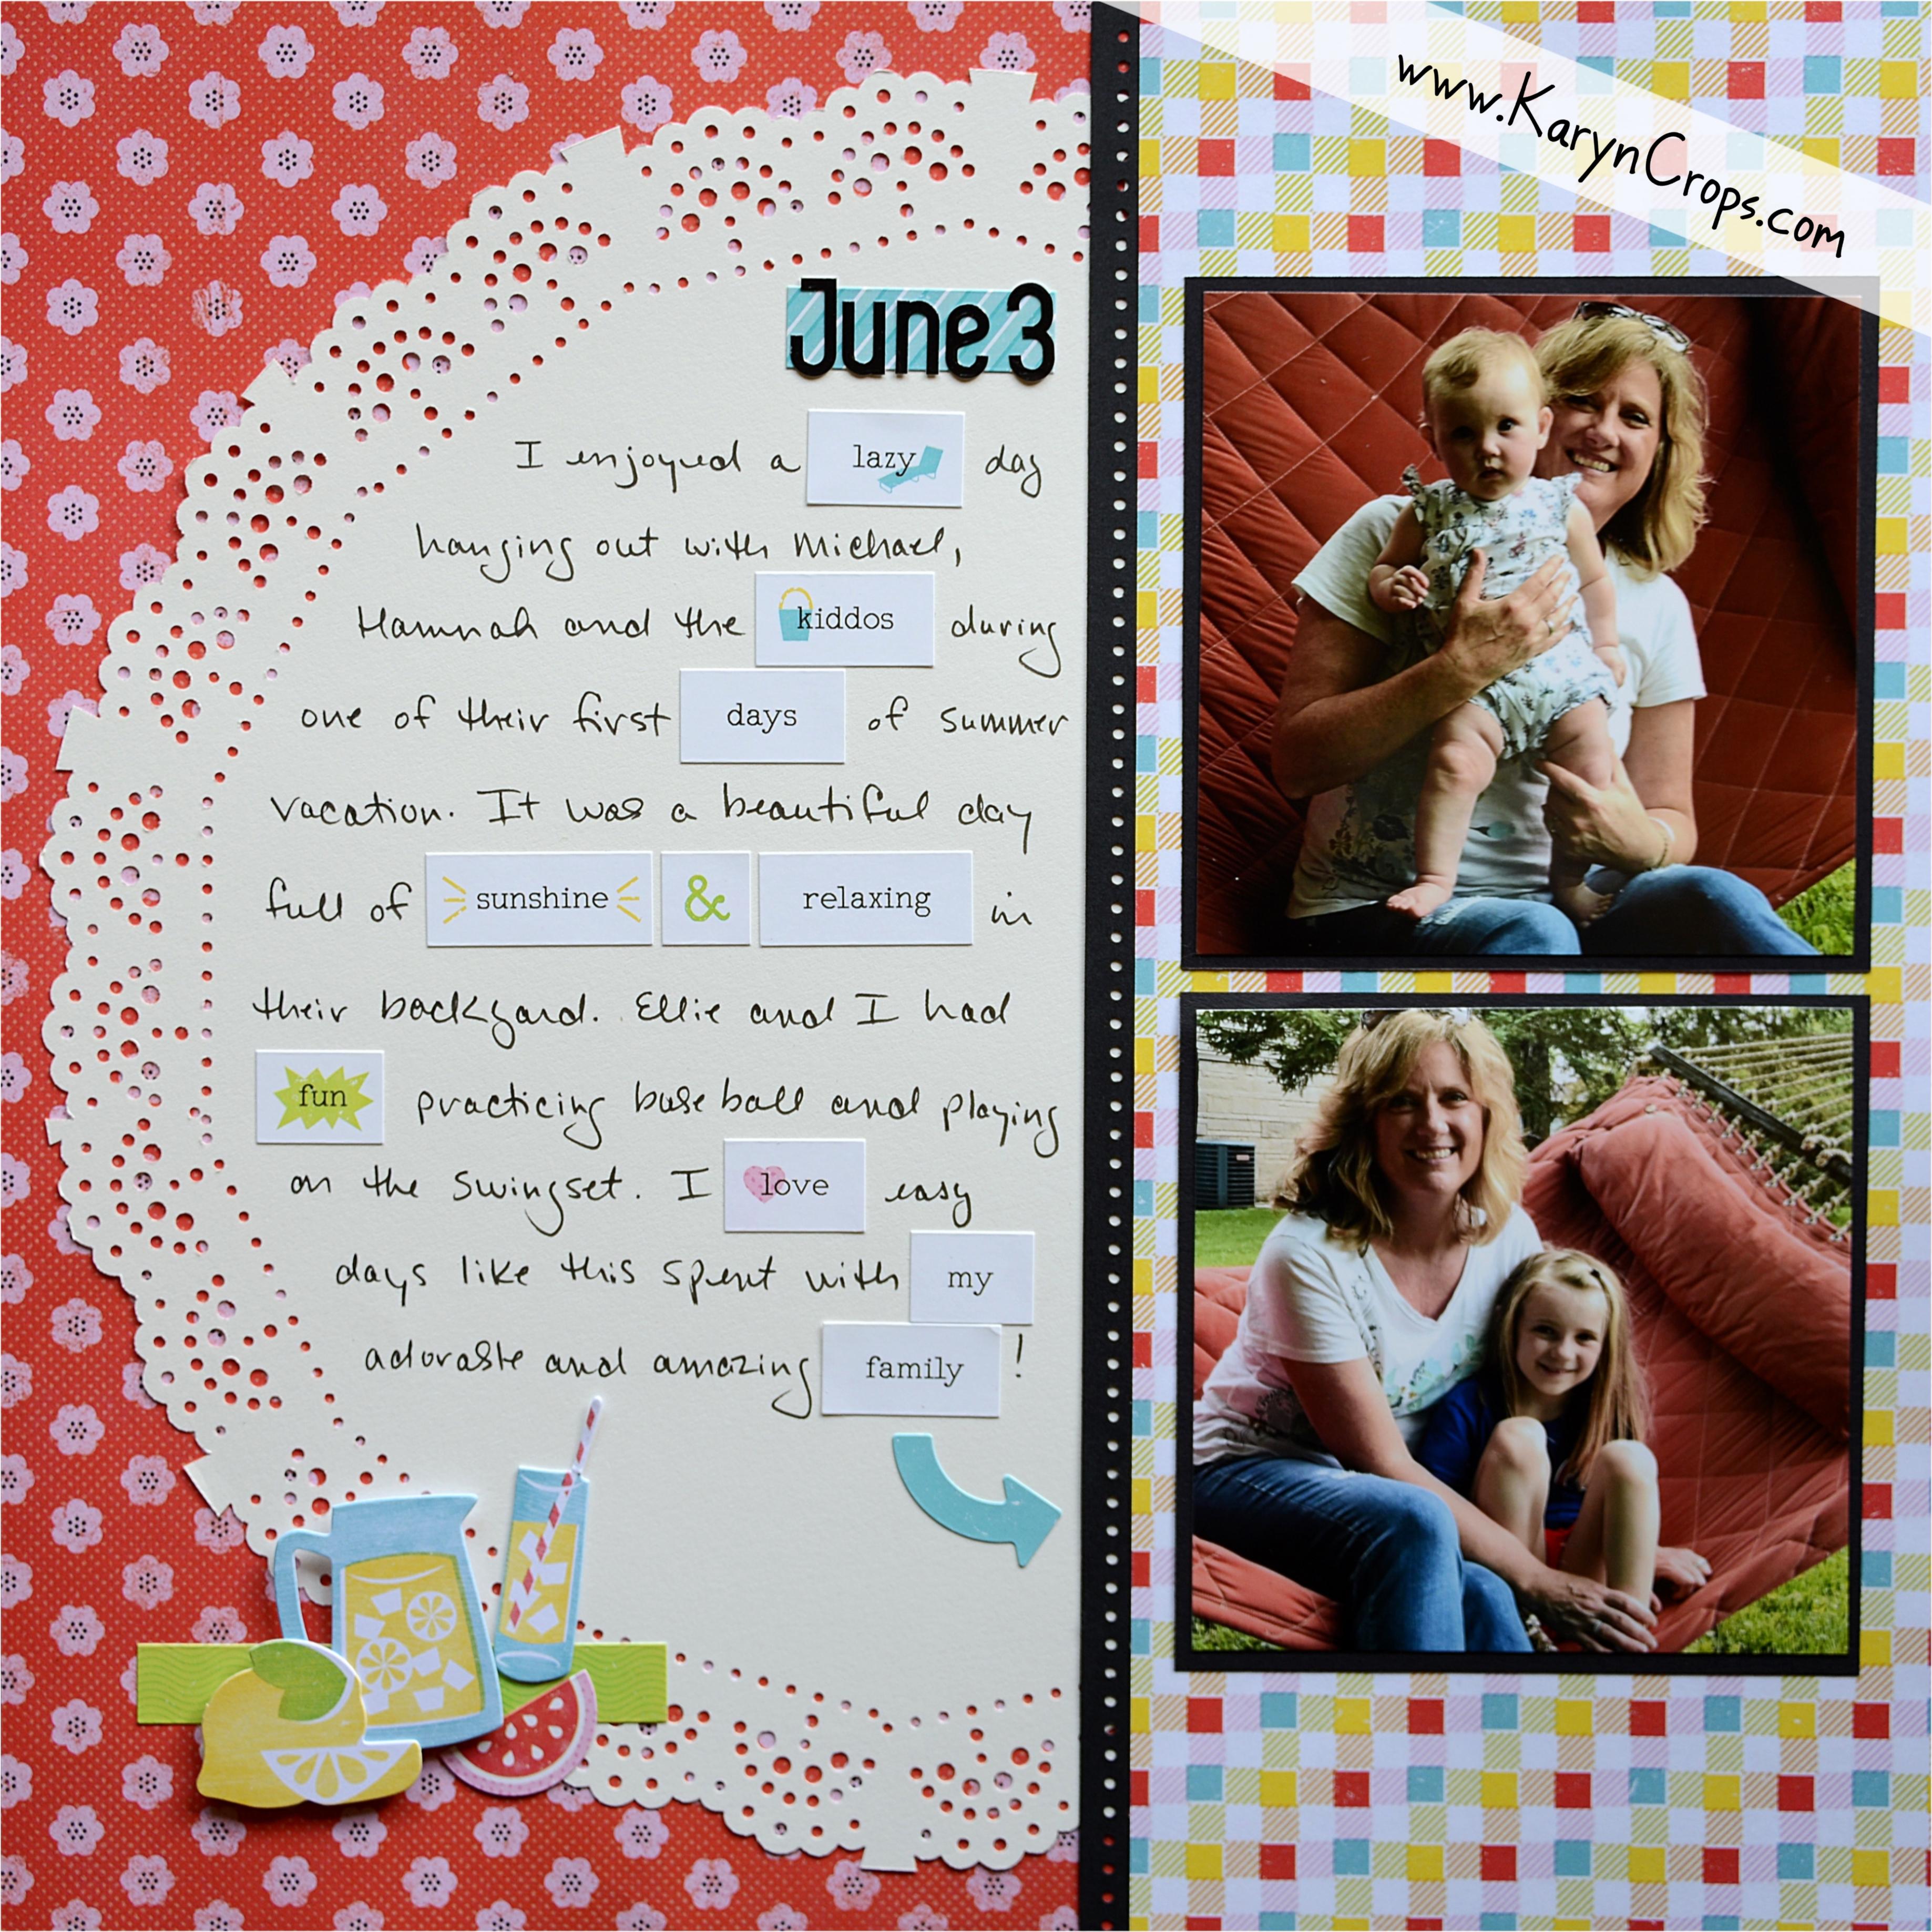 KarynCropsCitrusSummerBlogPart2 - Page 081